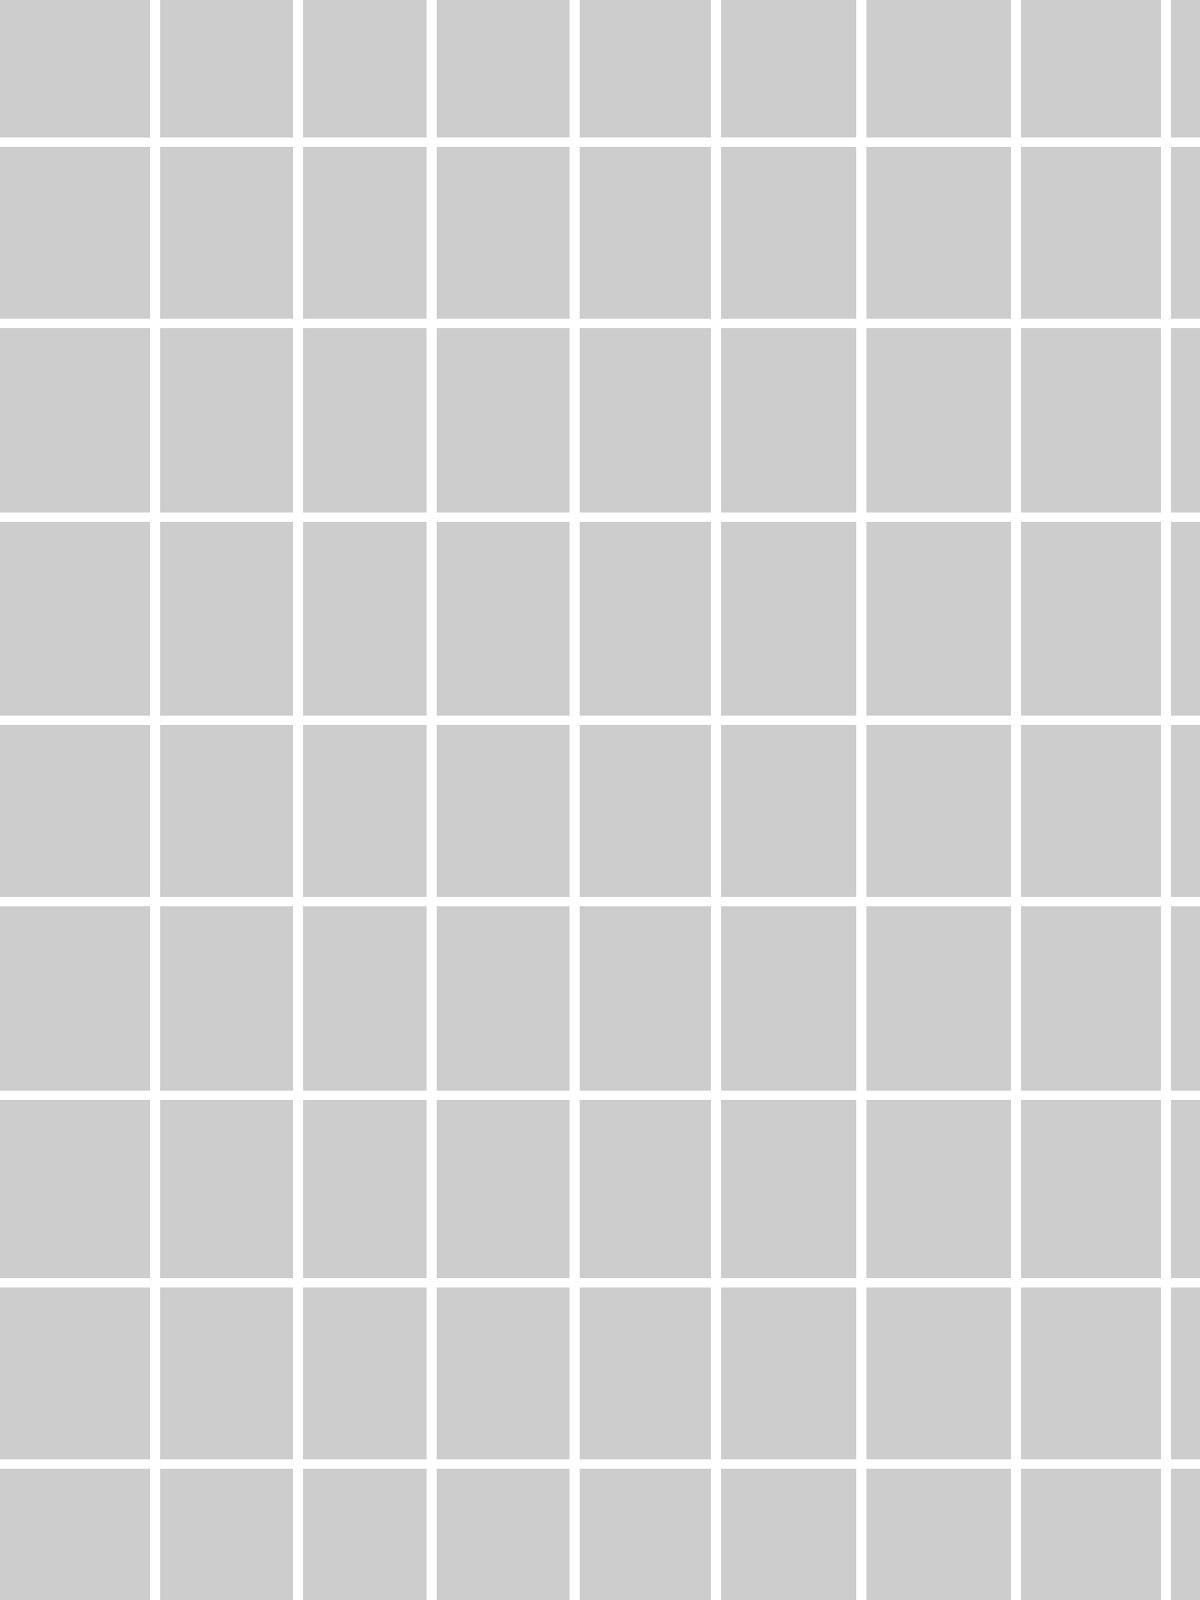 Iphone 6 wallpaper tumblr white - Grey Stripe Wallpaper